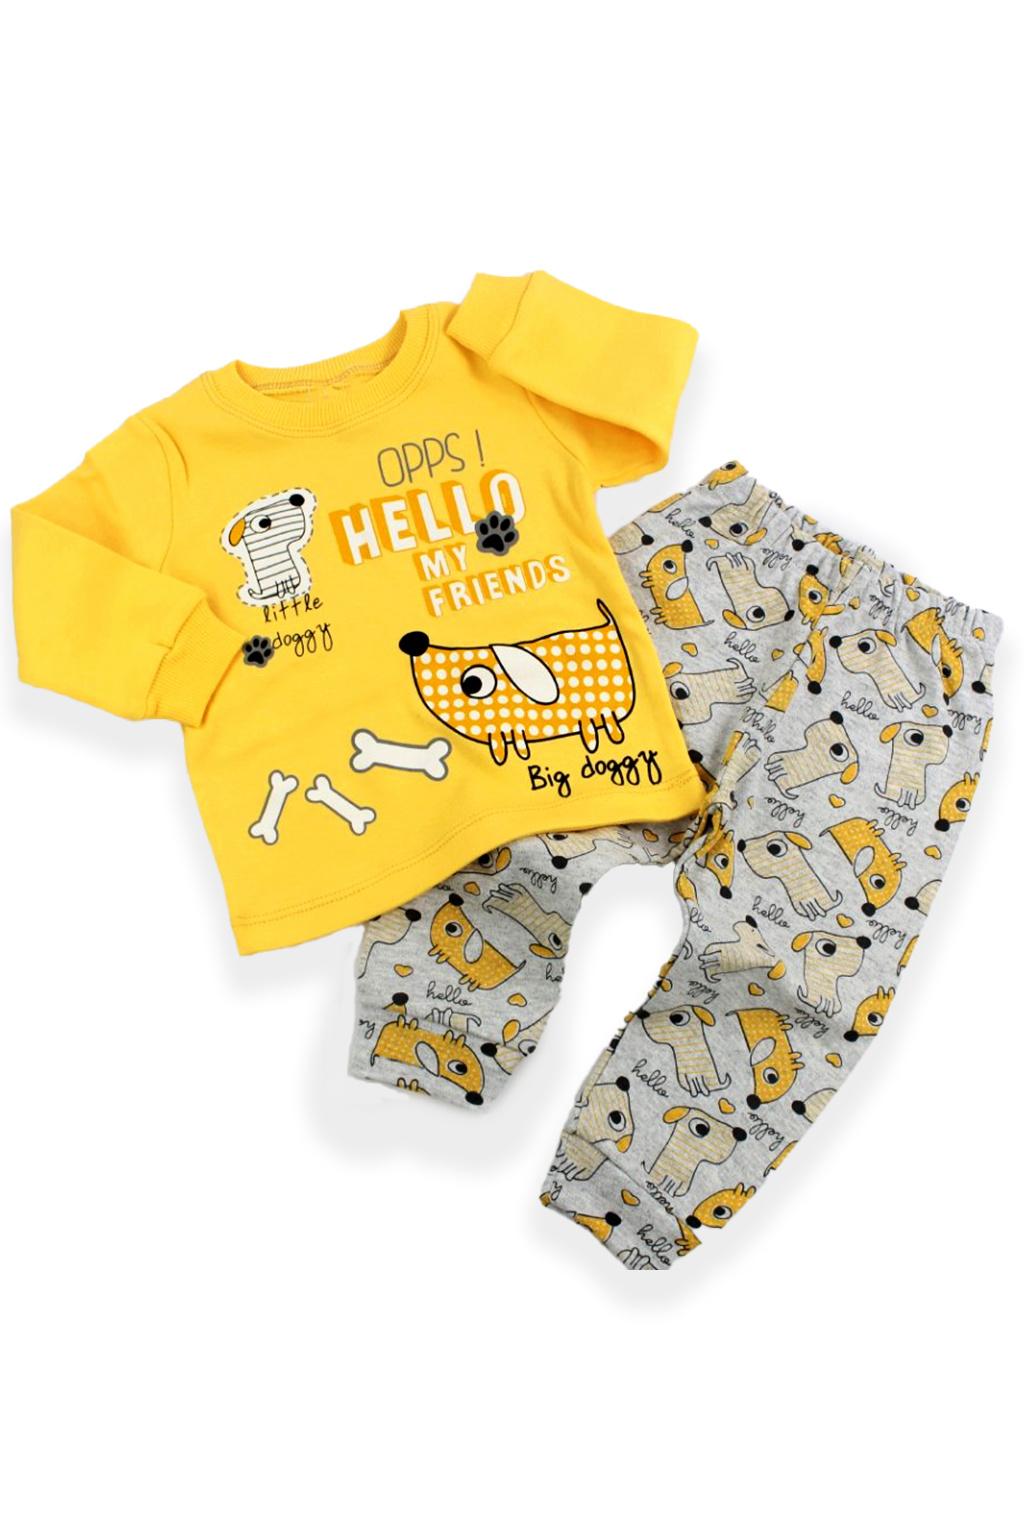 Dětské dvojdílné pyžamo žluté